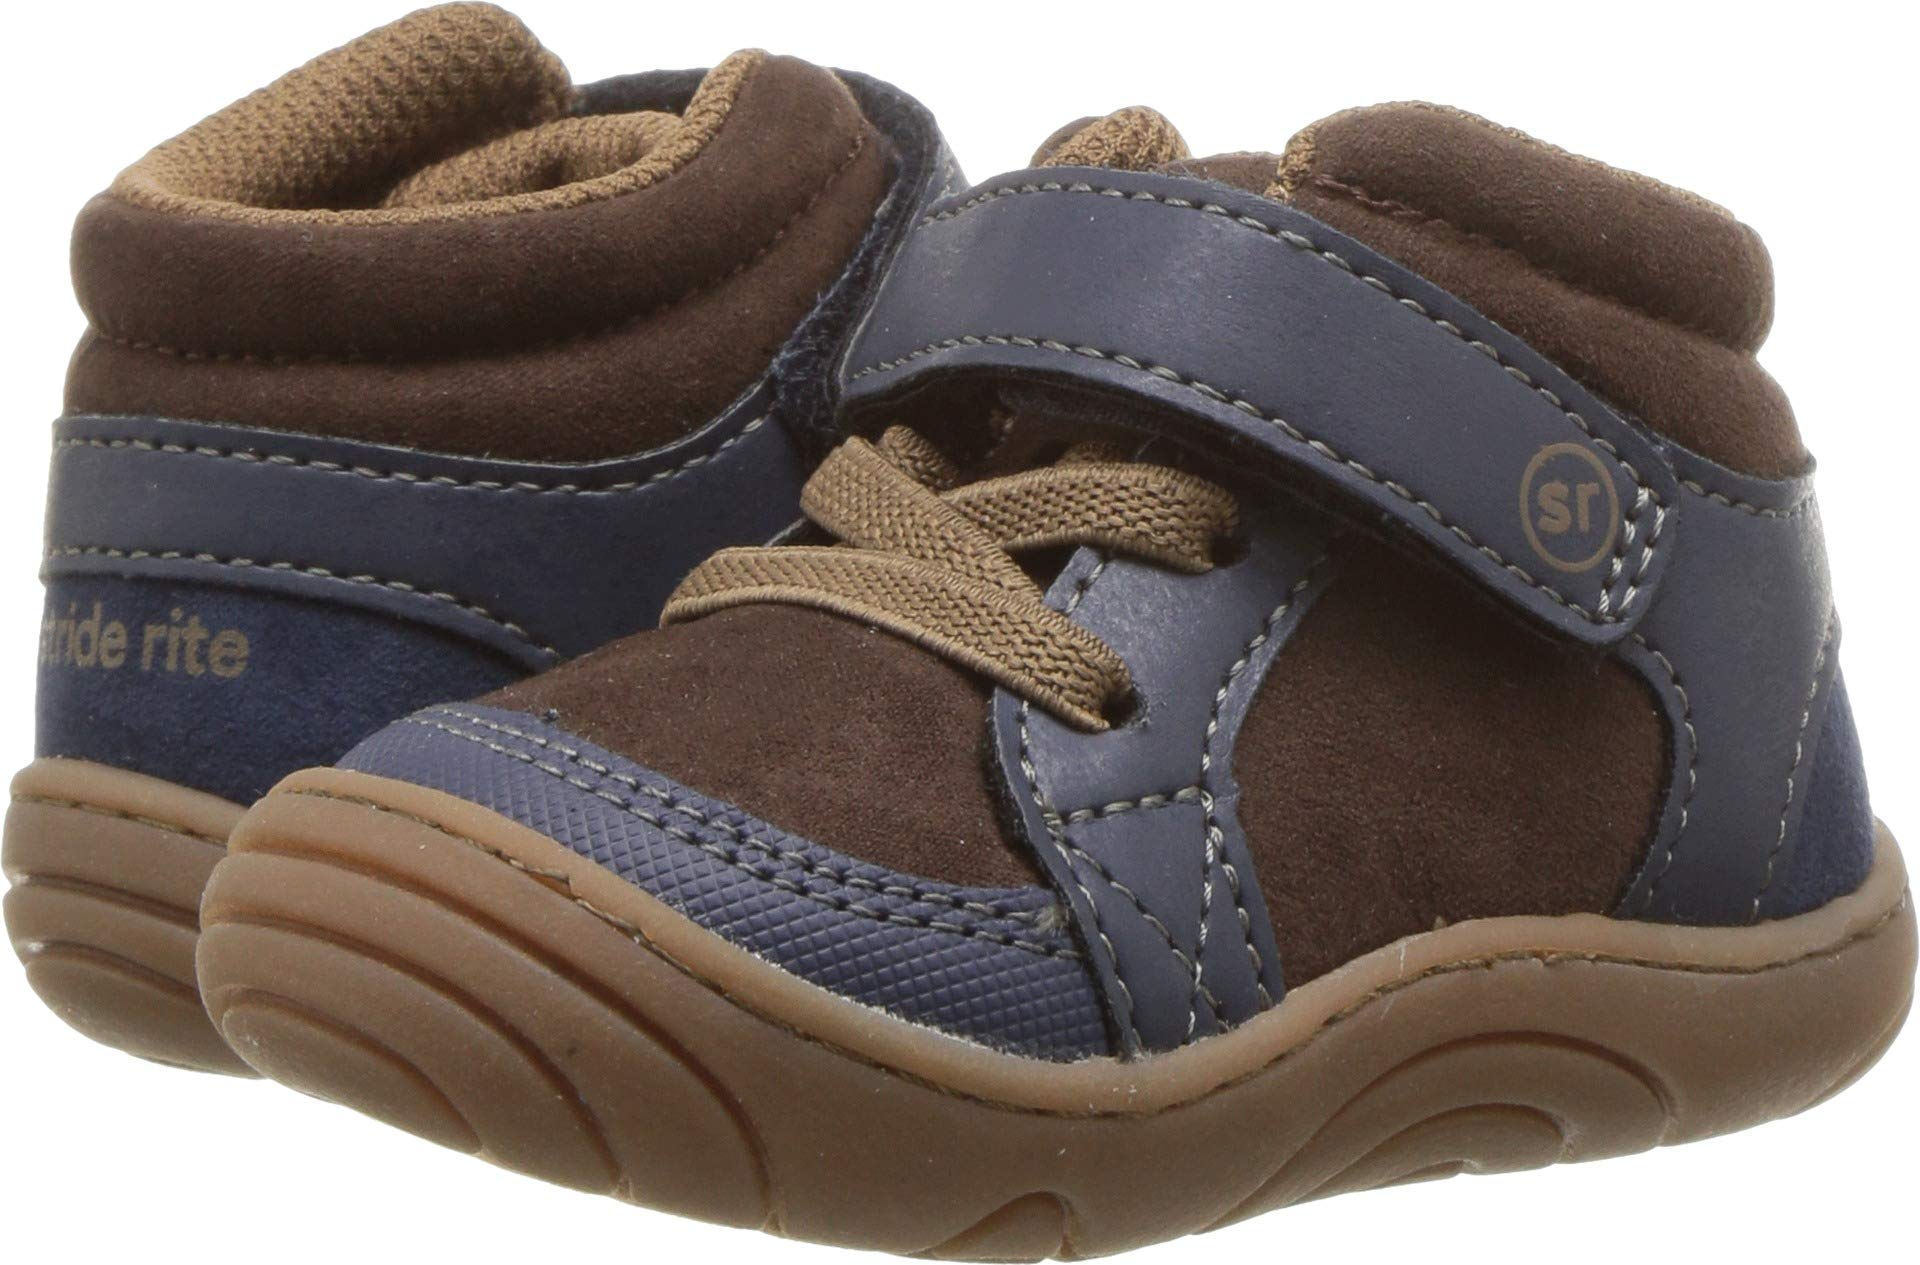 Stride Rite Boys' SR-Ethan High Top Sneaker, Navy/Brown, 6 M US Toddler